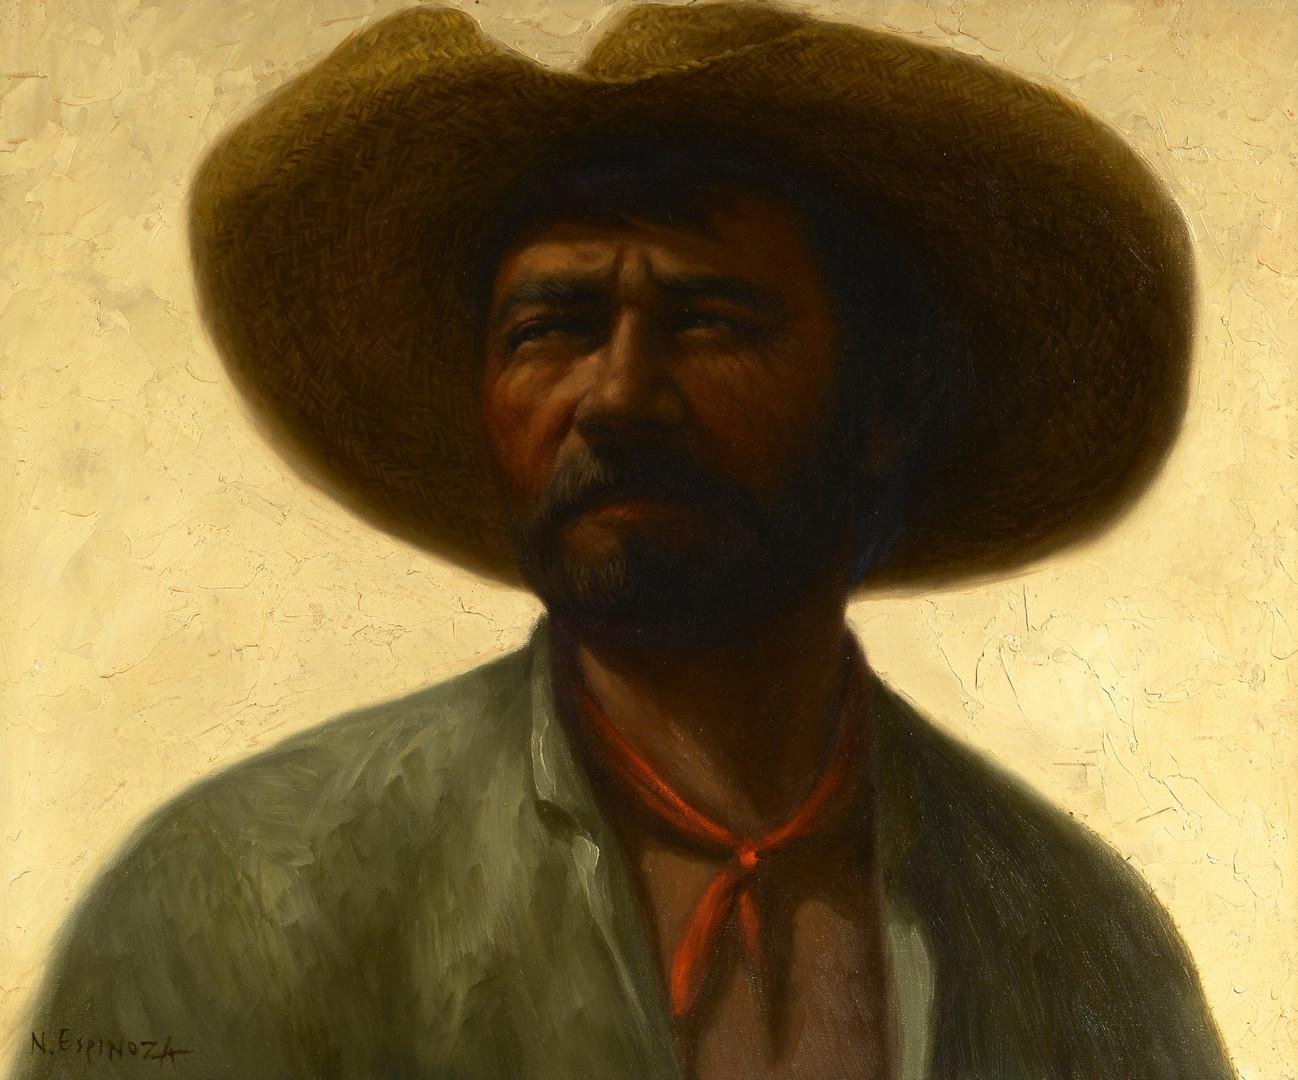 Lot 438: Noel Espinoza Oil on Canvas Portrait